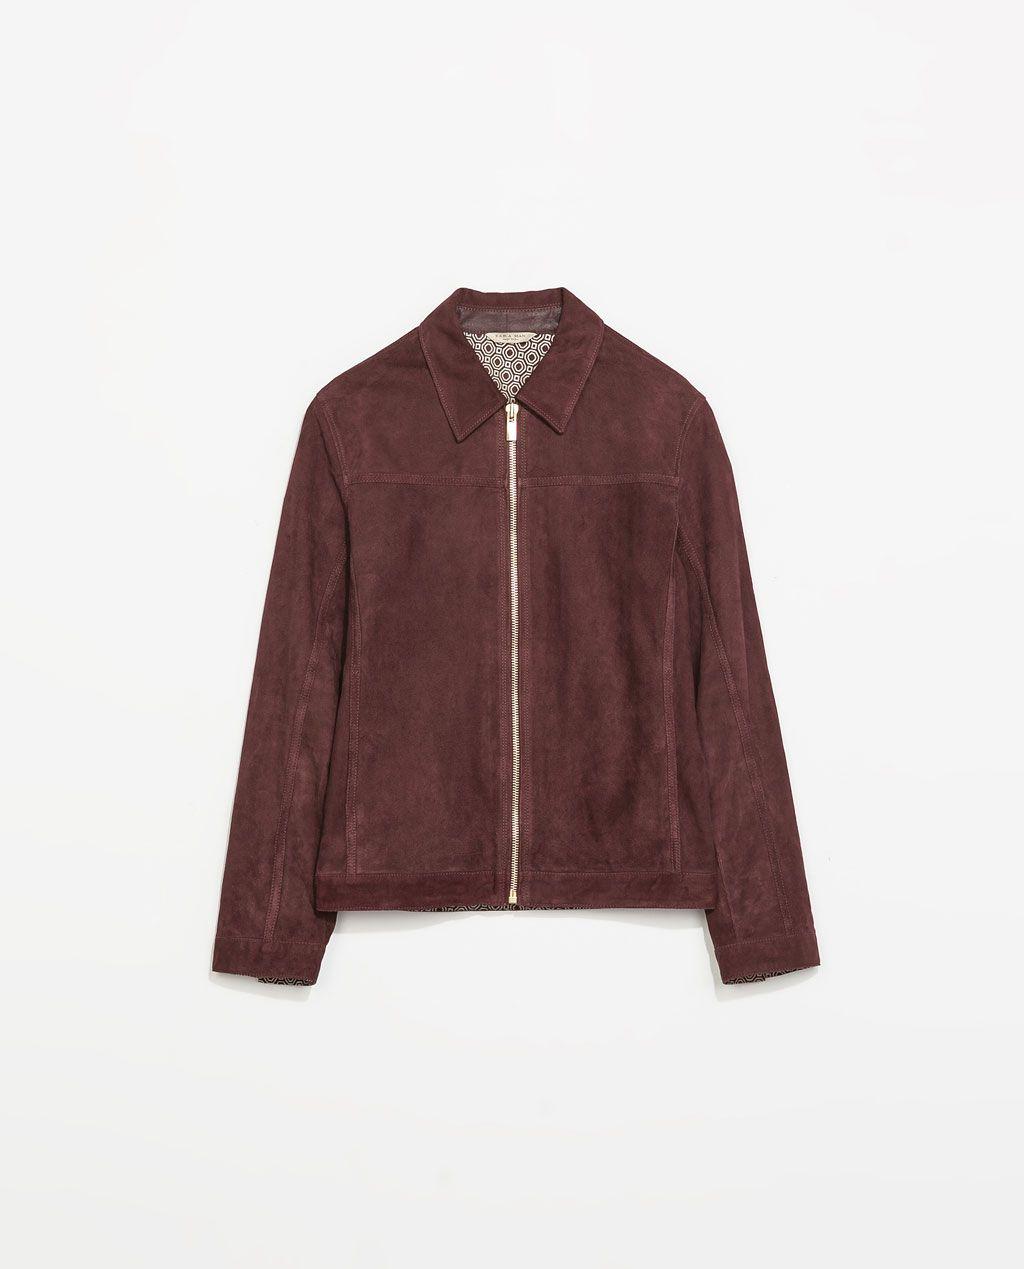 Zara New This Week Suede Jacket Zara Man Jacket Jackets Suede Jacket